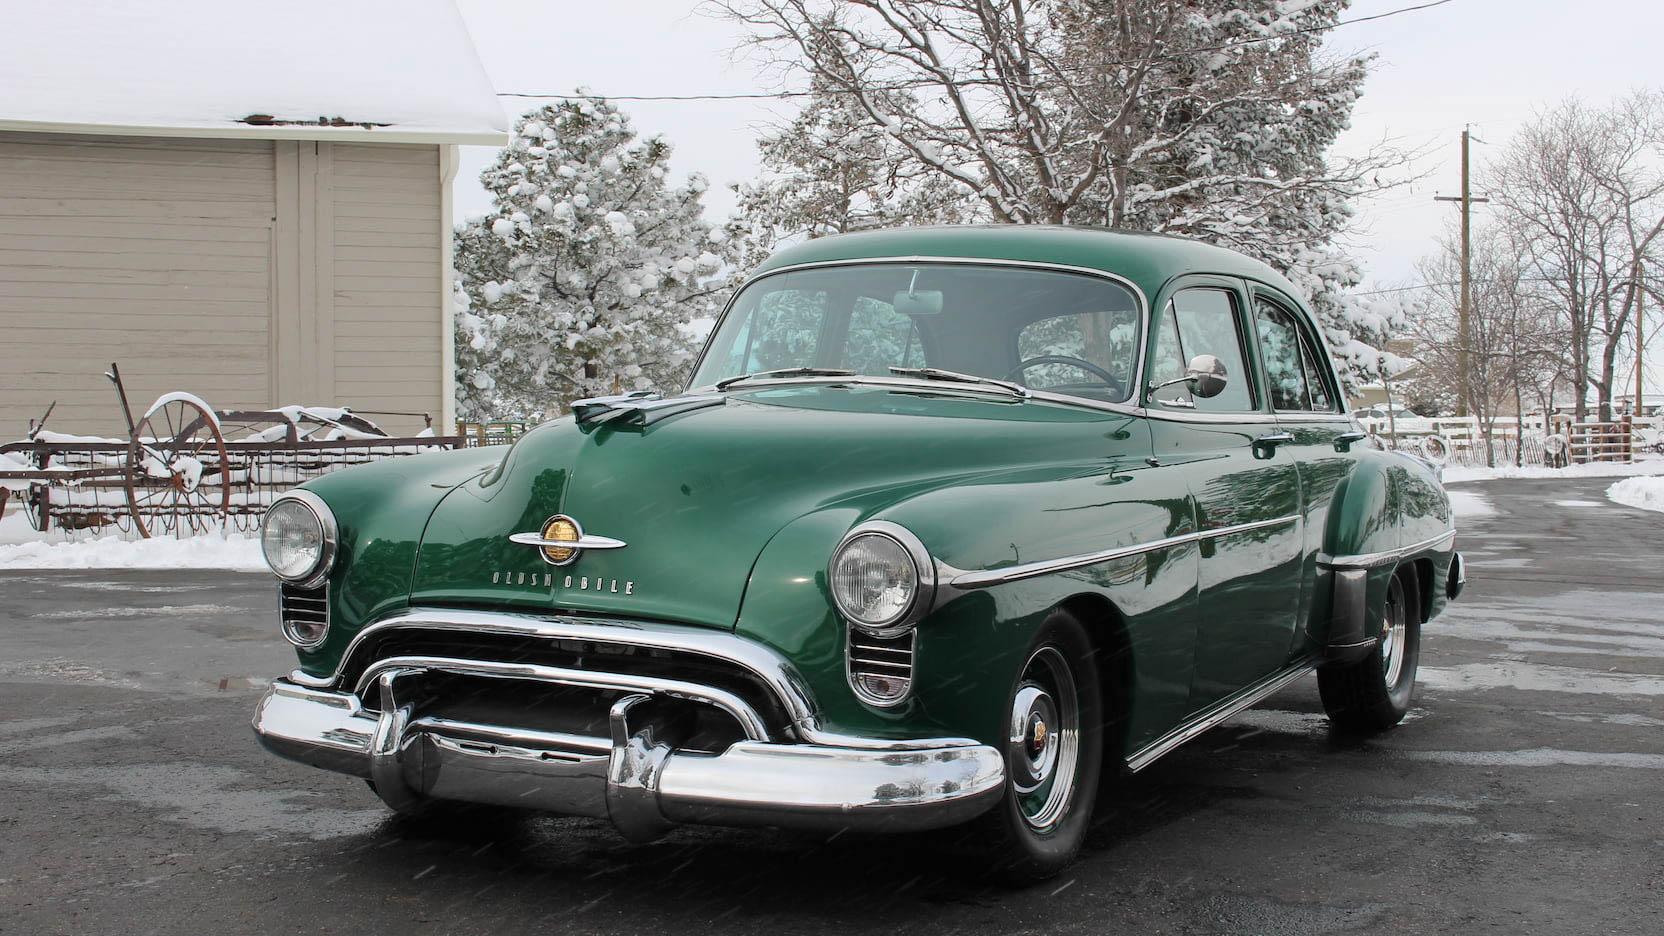 1950 Oldsmobile 88 front 3/4